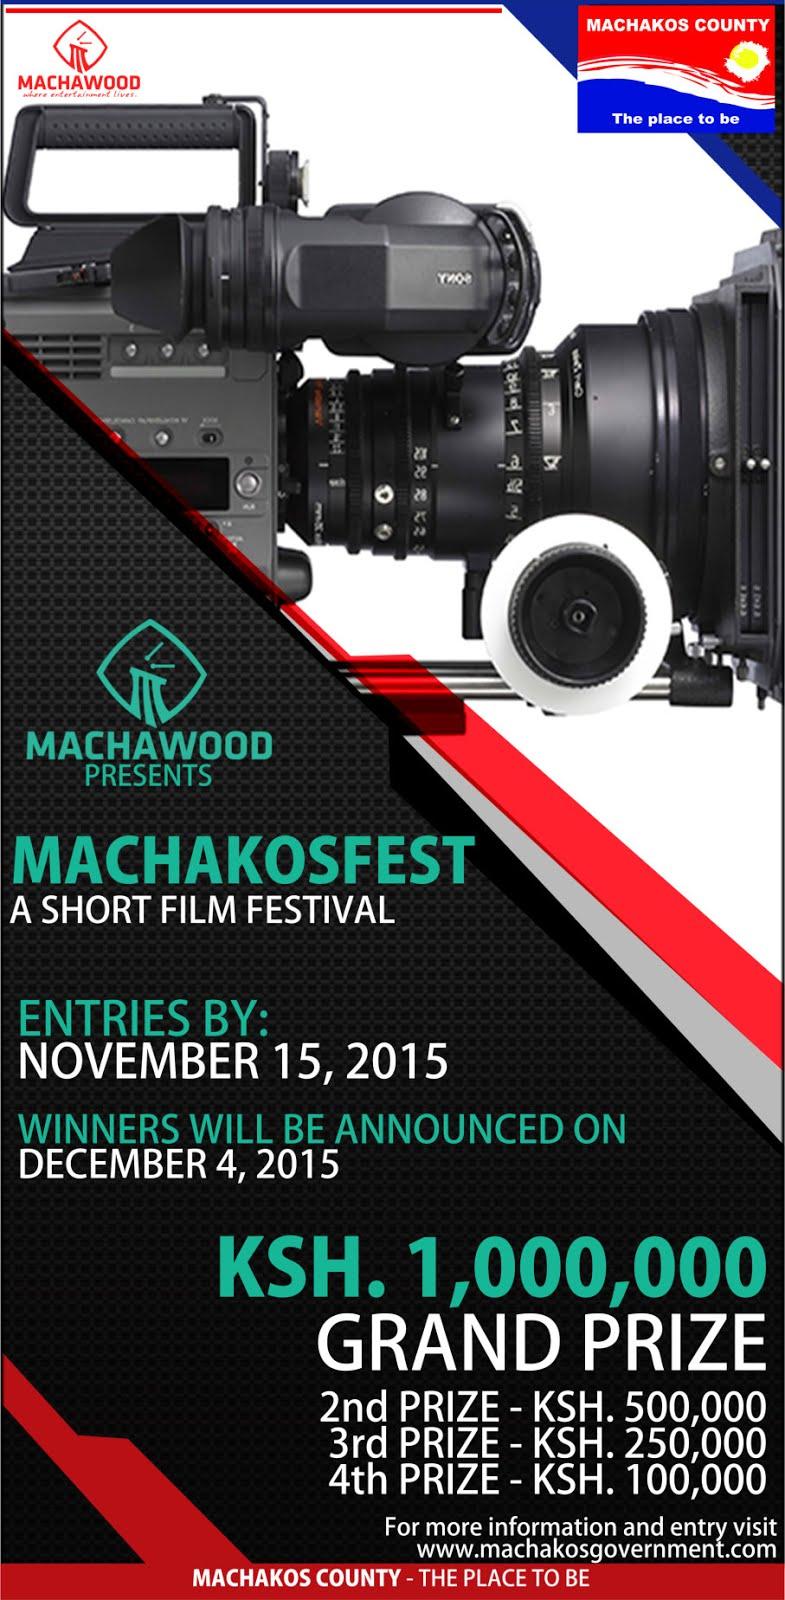 Machakosfest